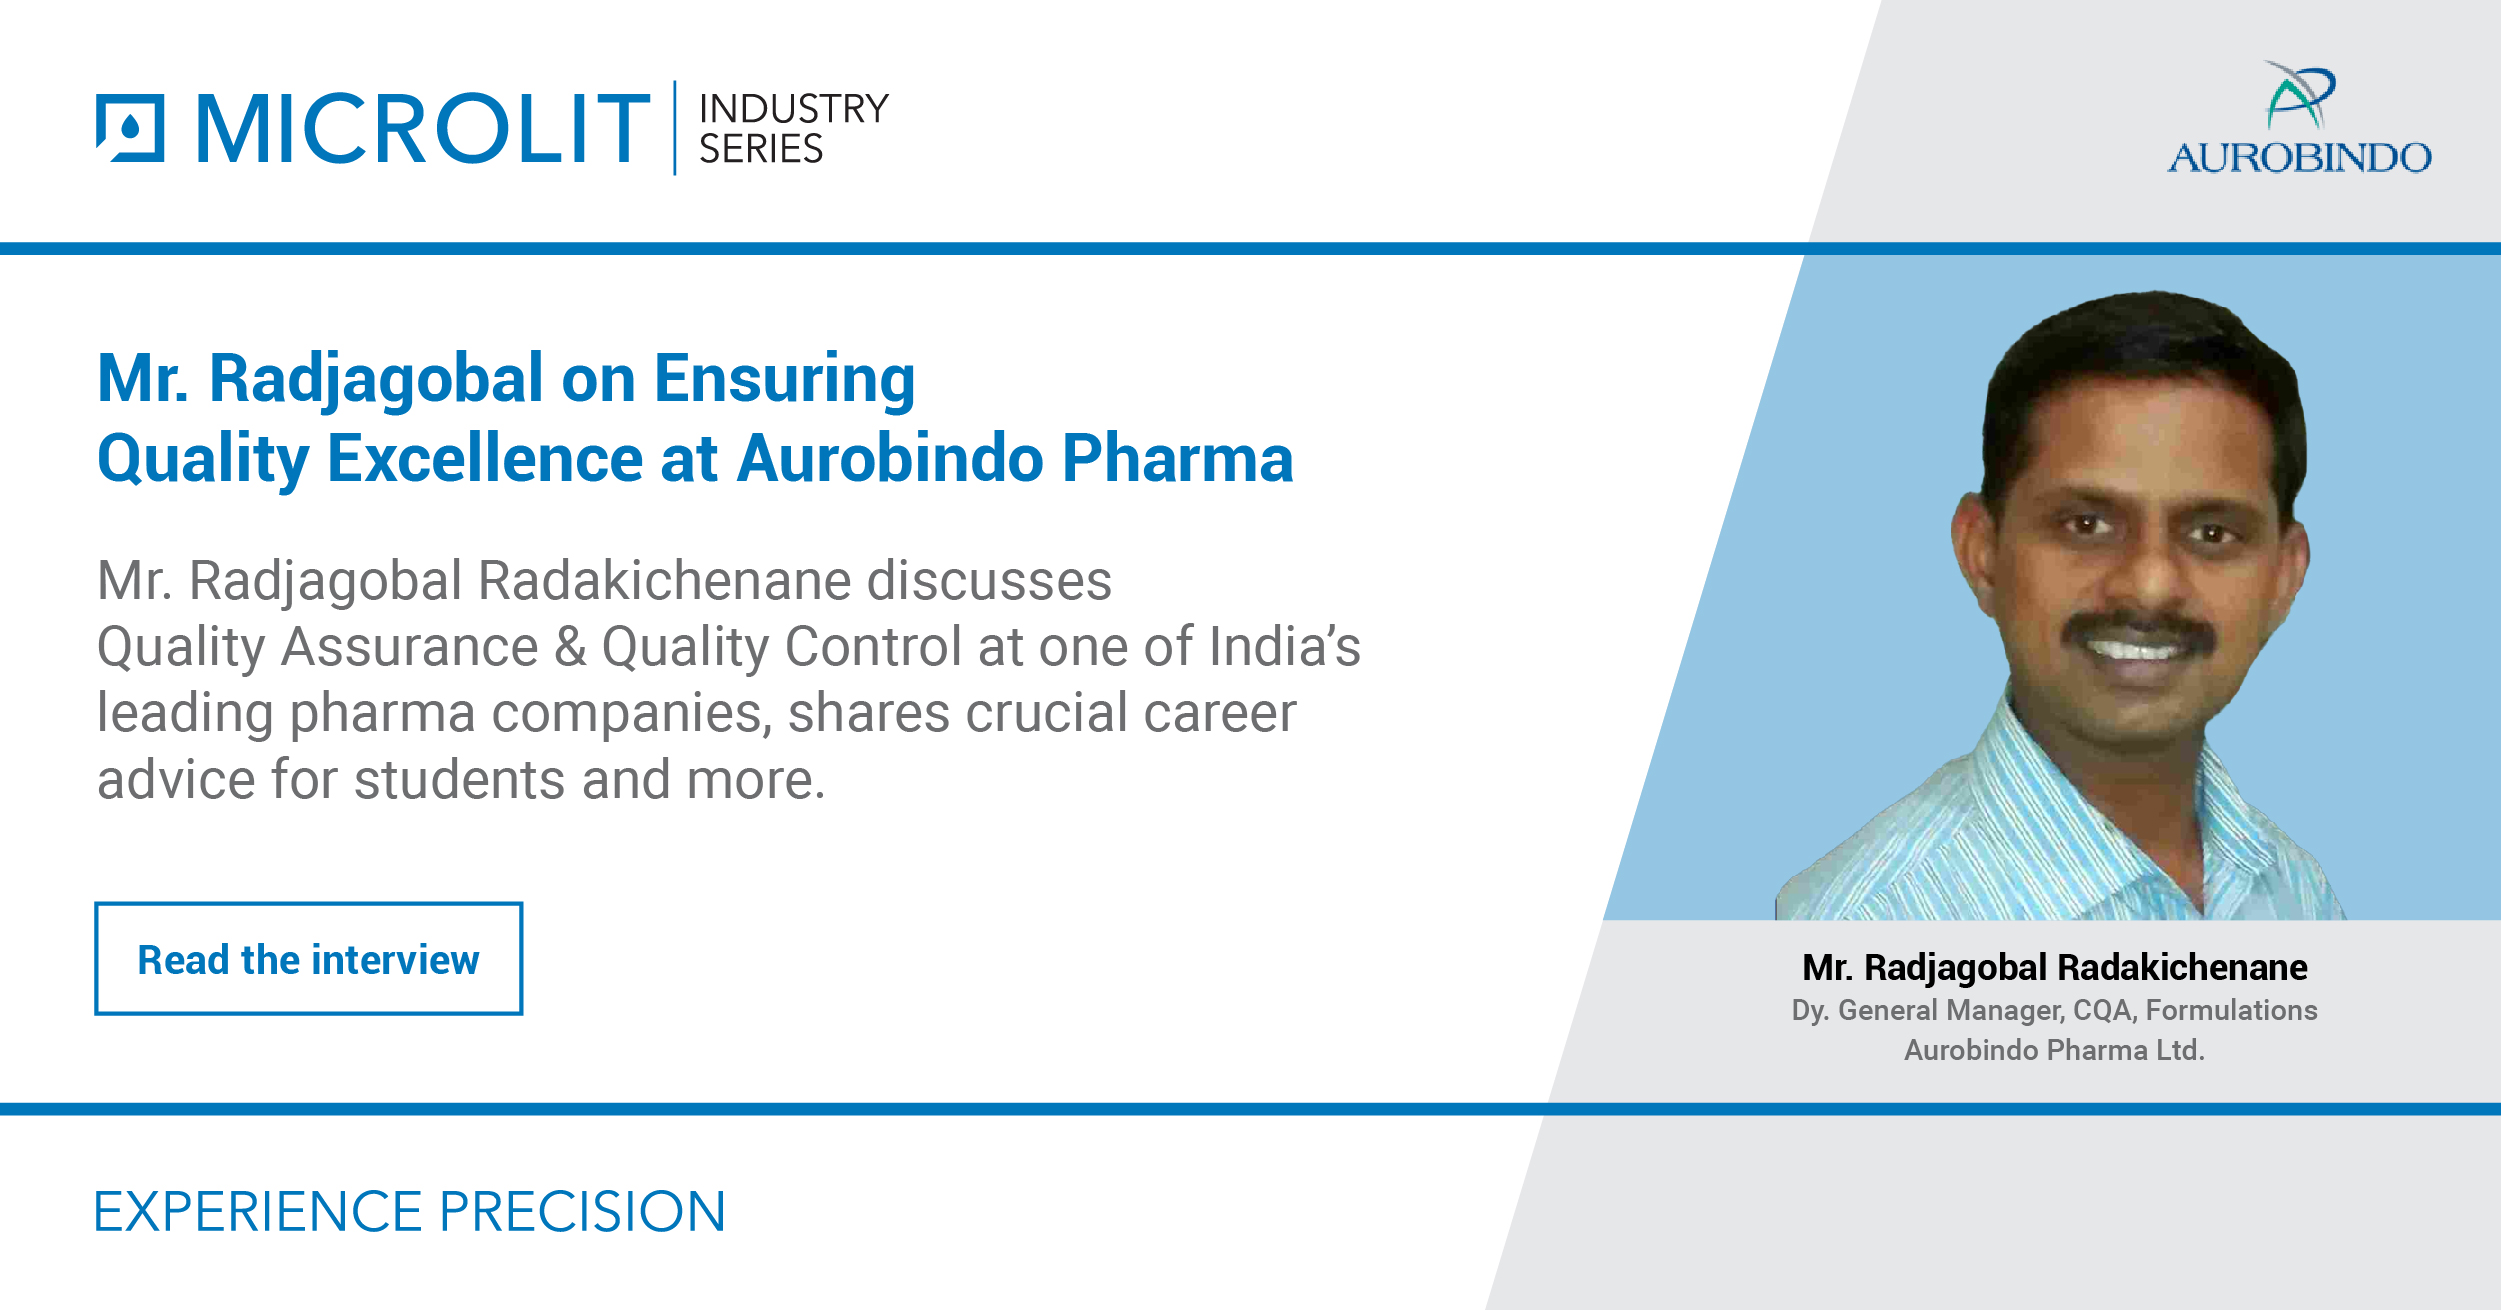 Mr Radjagobal on Ensuring Quality Excellence at  Aurobindo Pharma